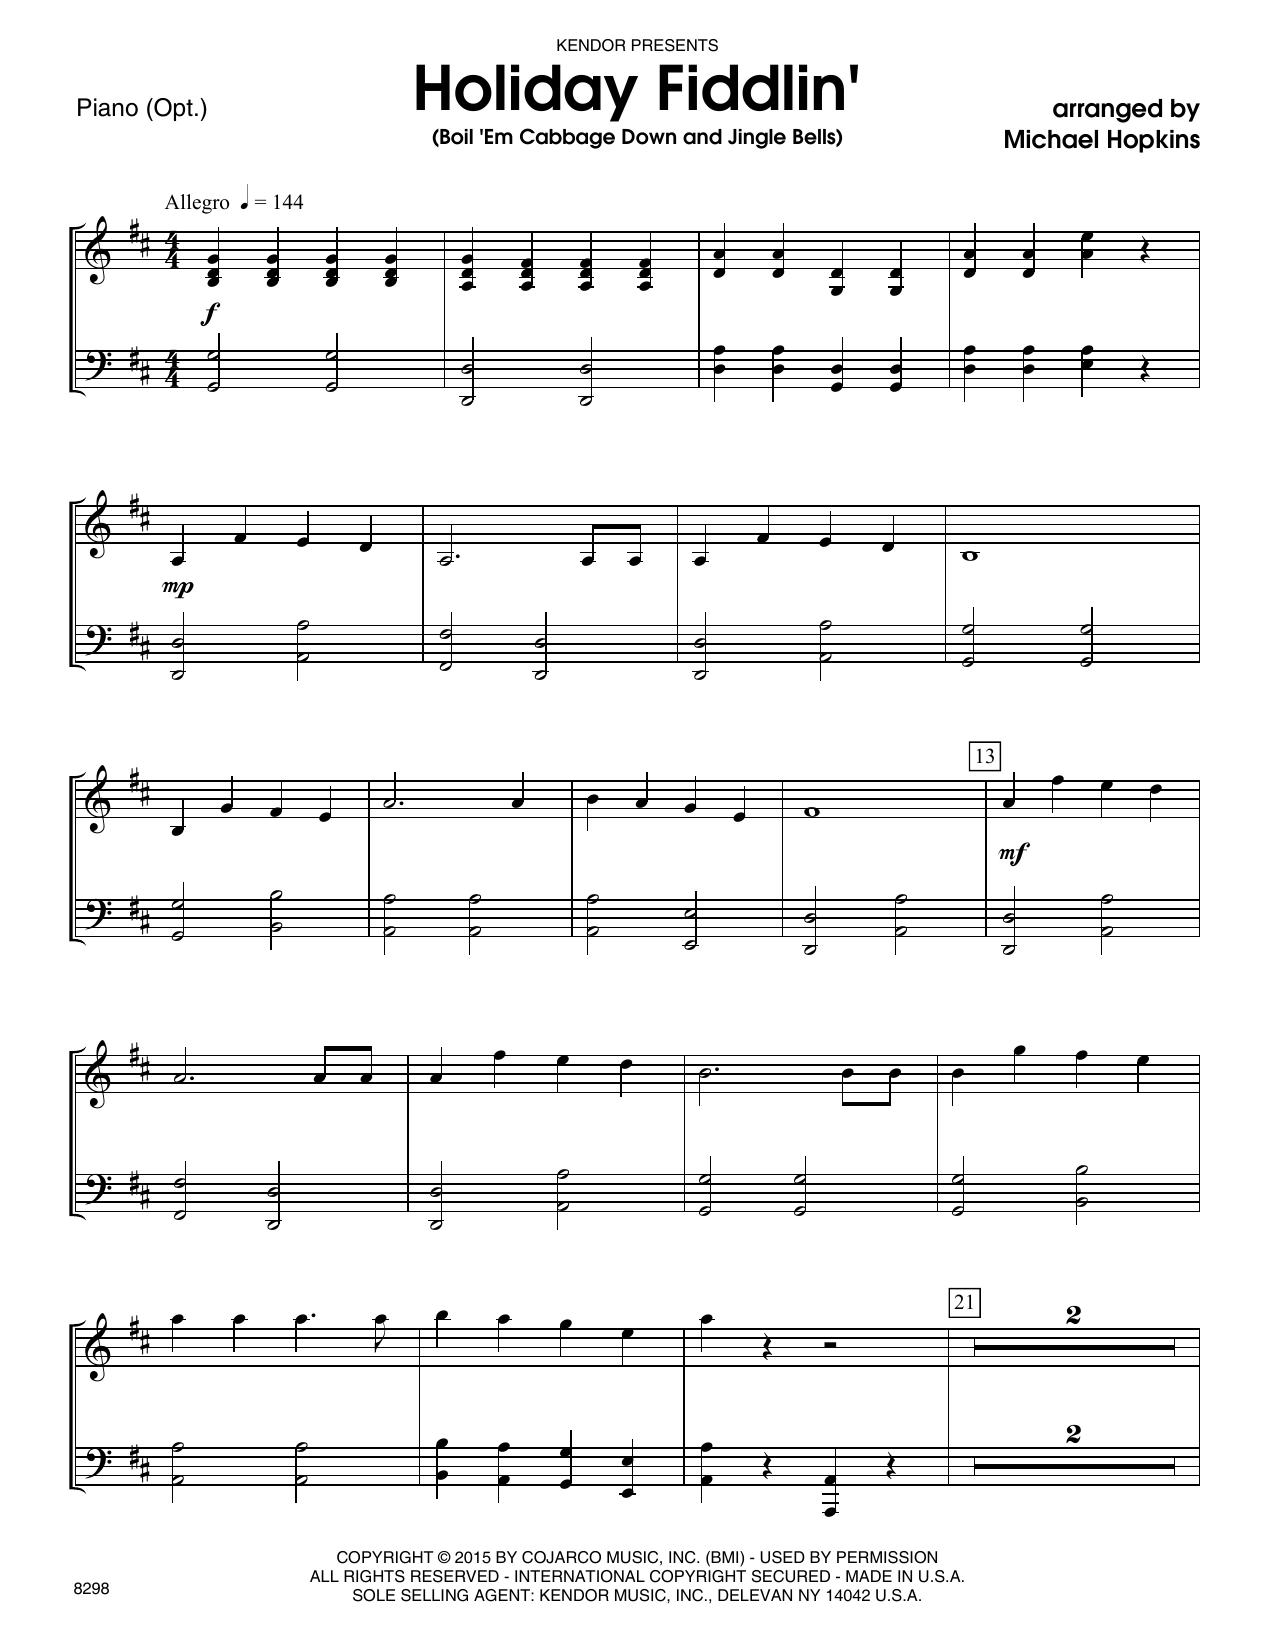 Michael Hopkins - Holiday Fiddlin' (Boil 'Em Cabbage Down and Jingle Bells) - Piano Accompaniment